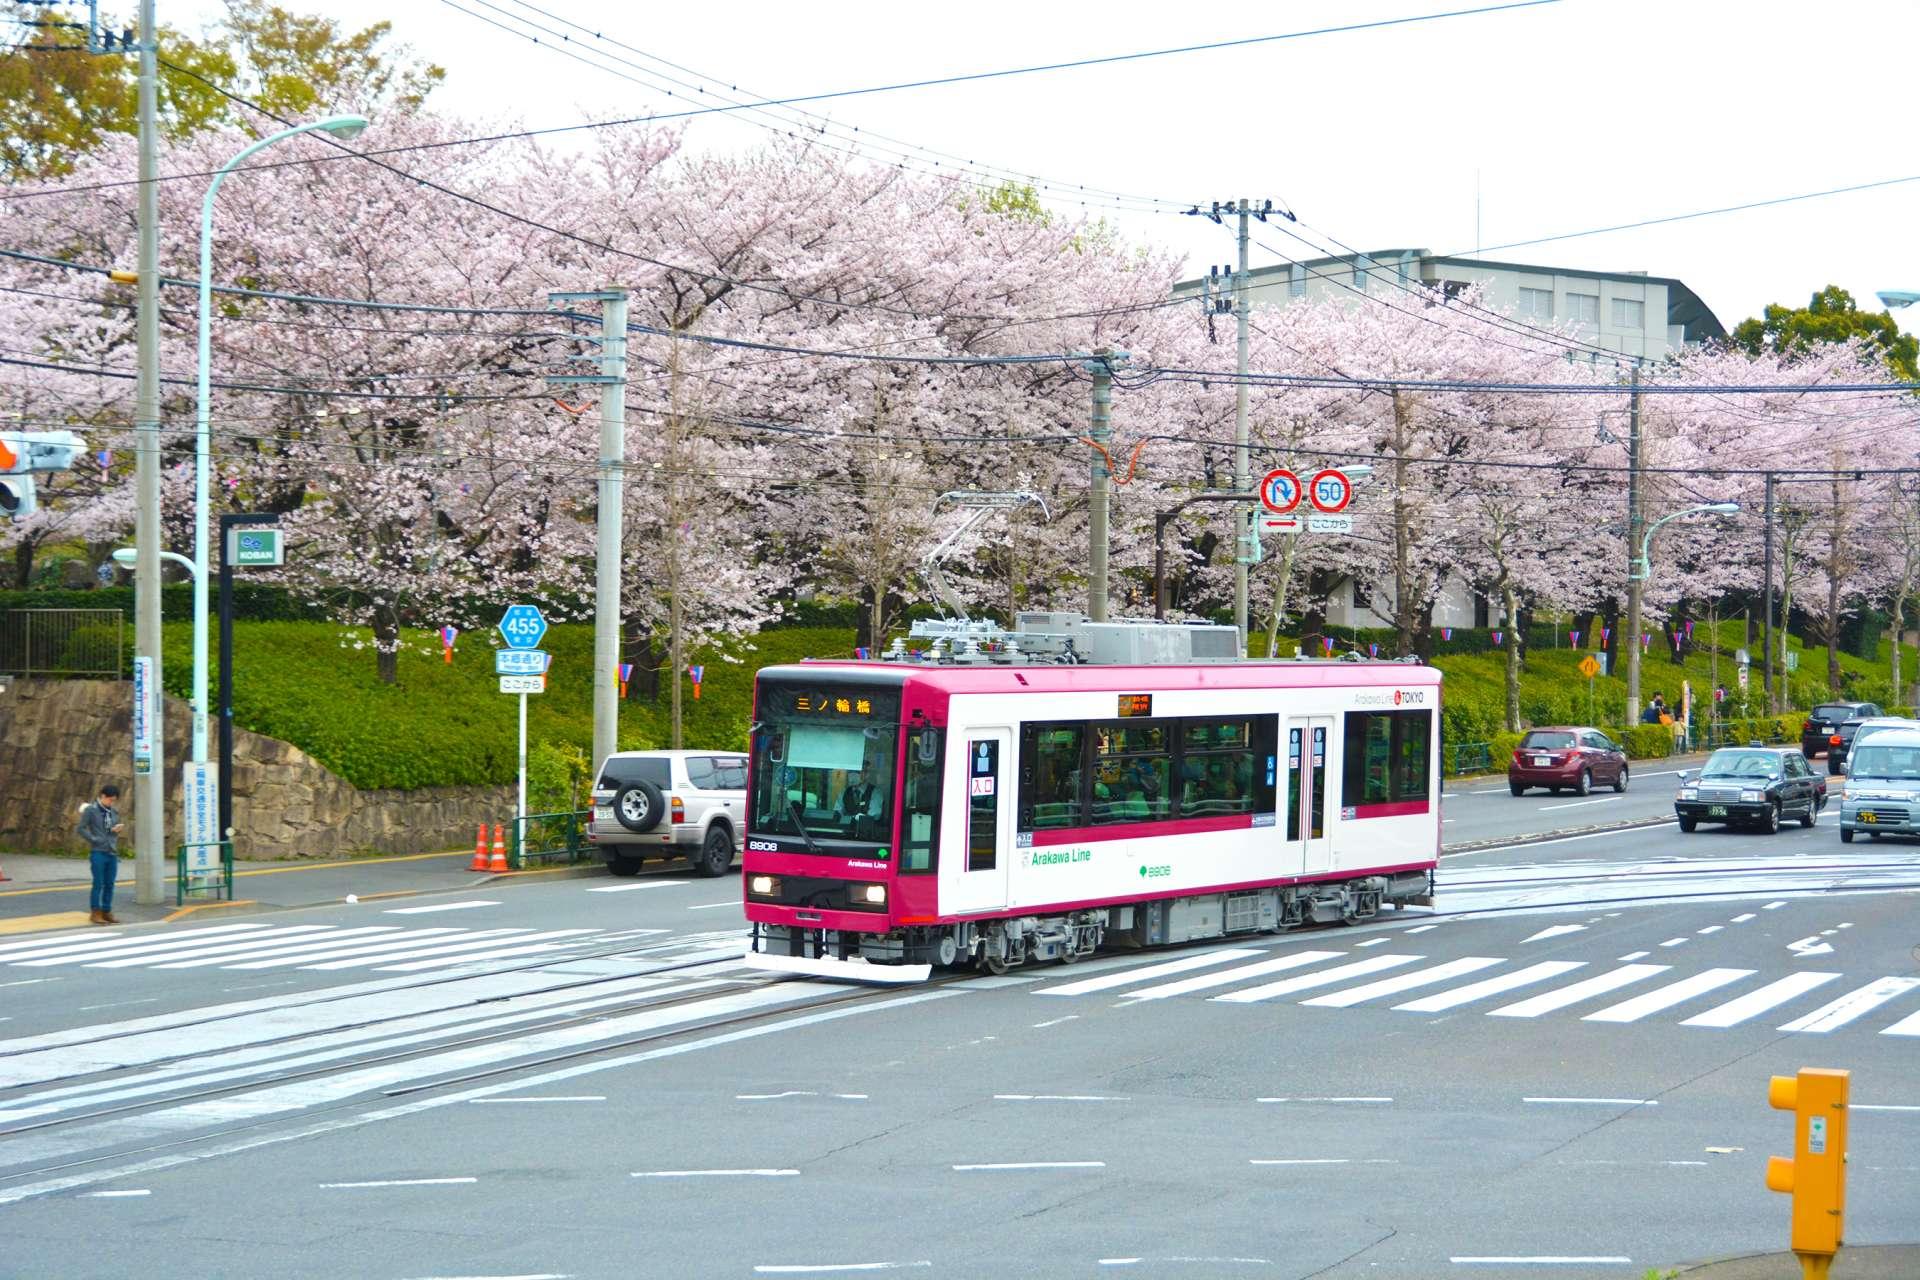 Tokyo Sakura Tram (都電荒川線)的沿線有許多賞櫻勝地!